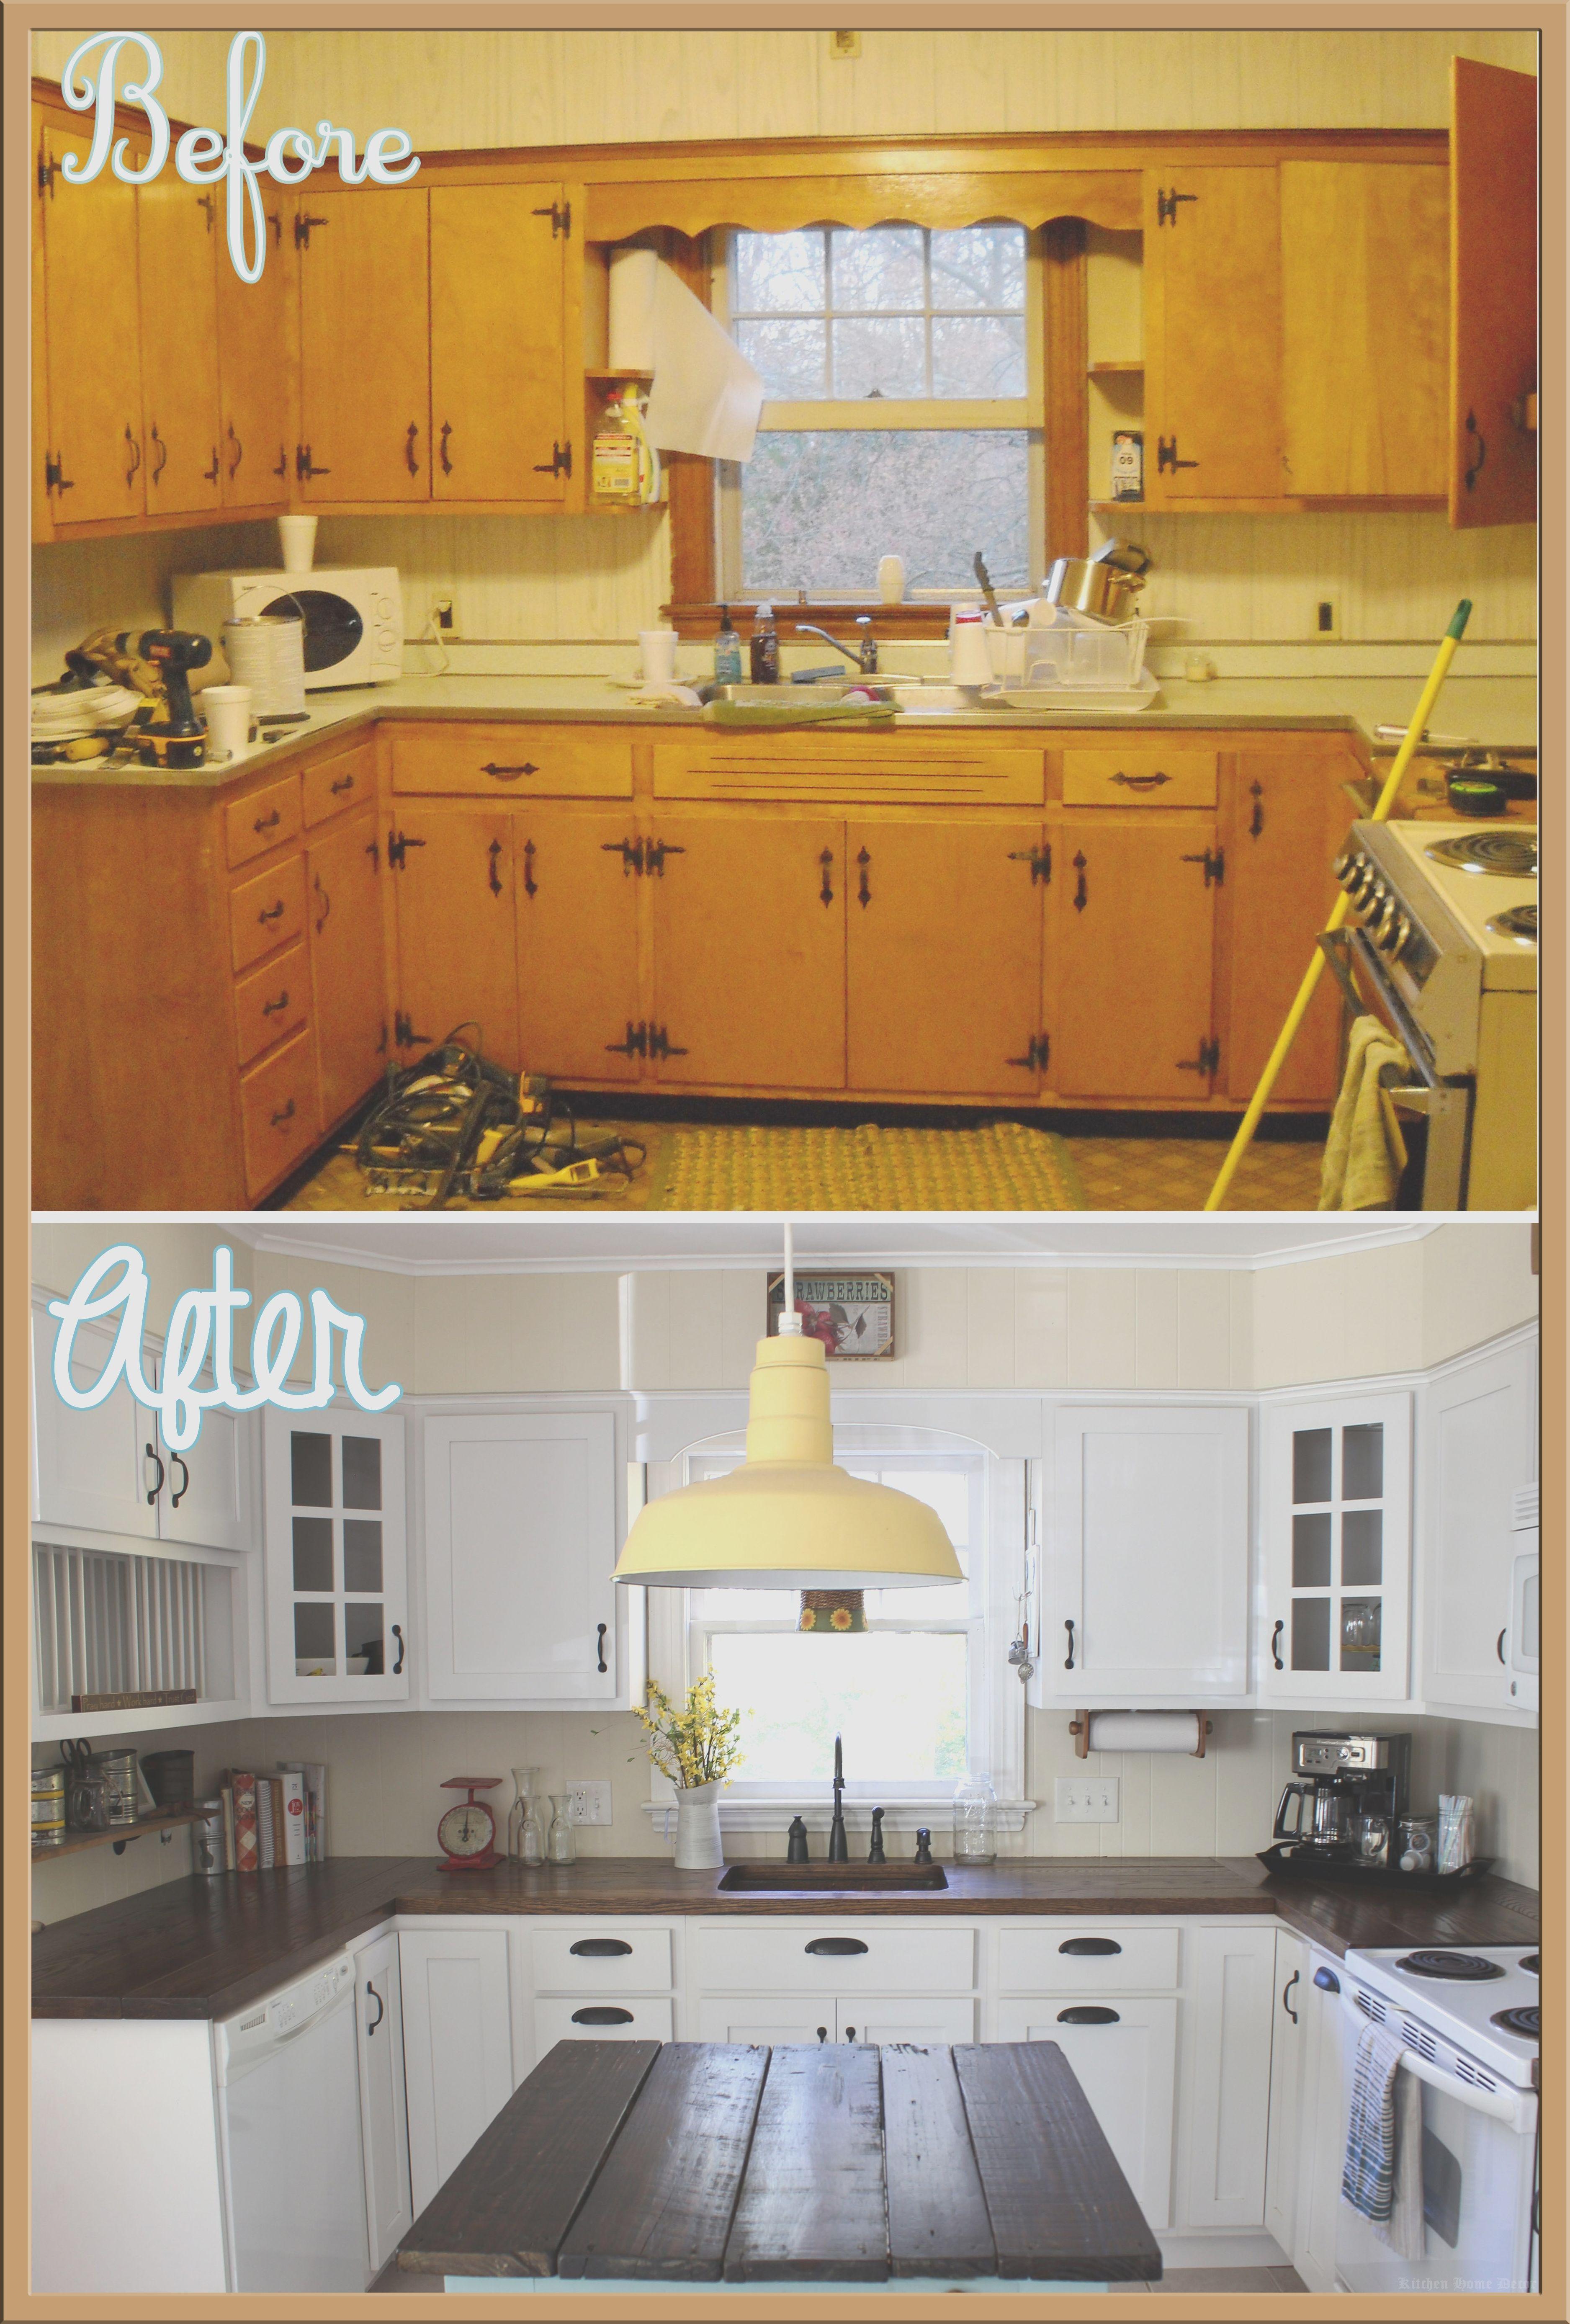 5 Simple Ways The Pros Use To Promote Kitchen Decor